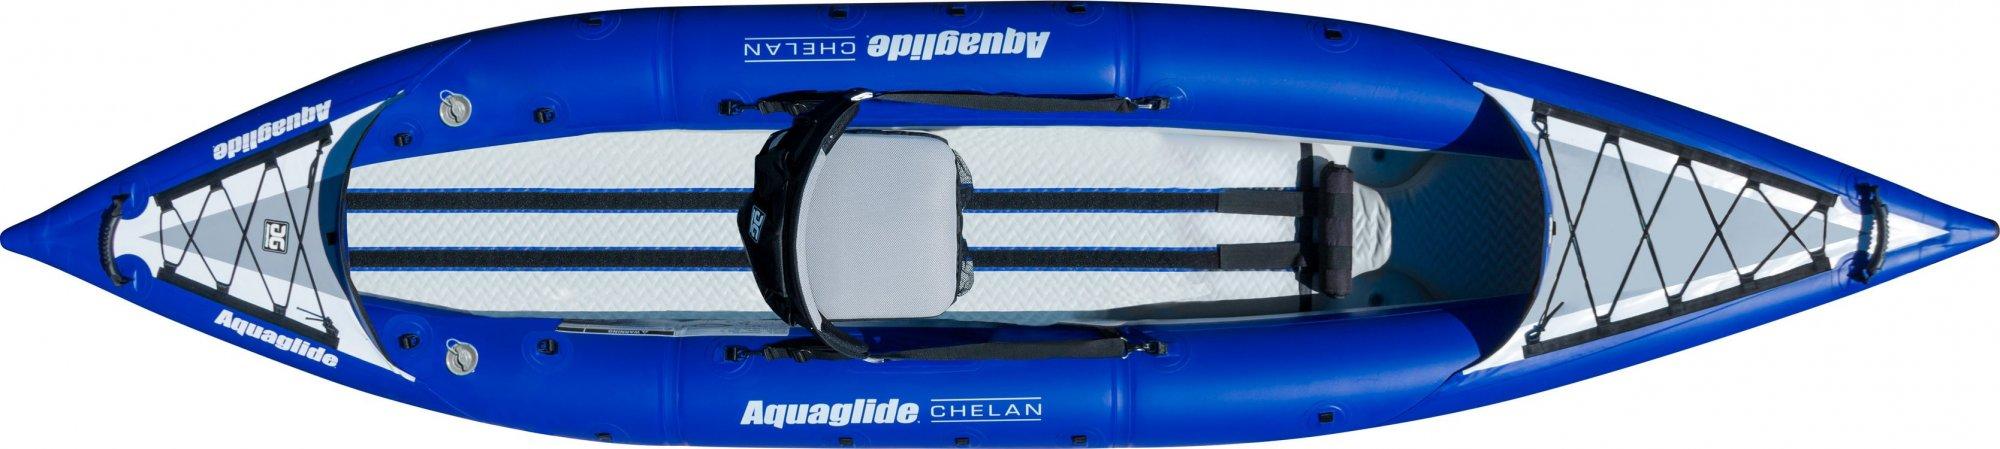 Aquaglide Chelan 140 HB Inflatable Kayak